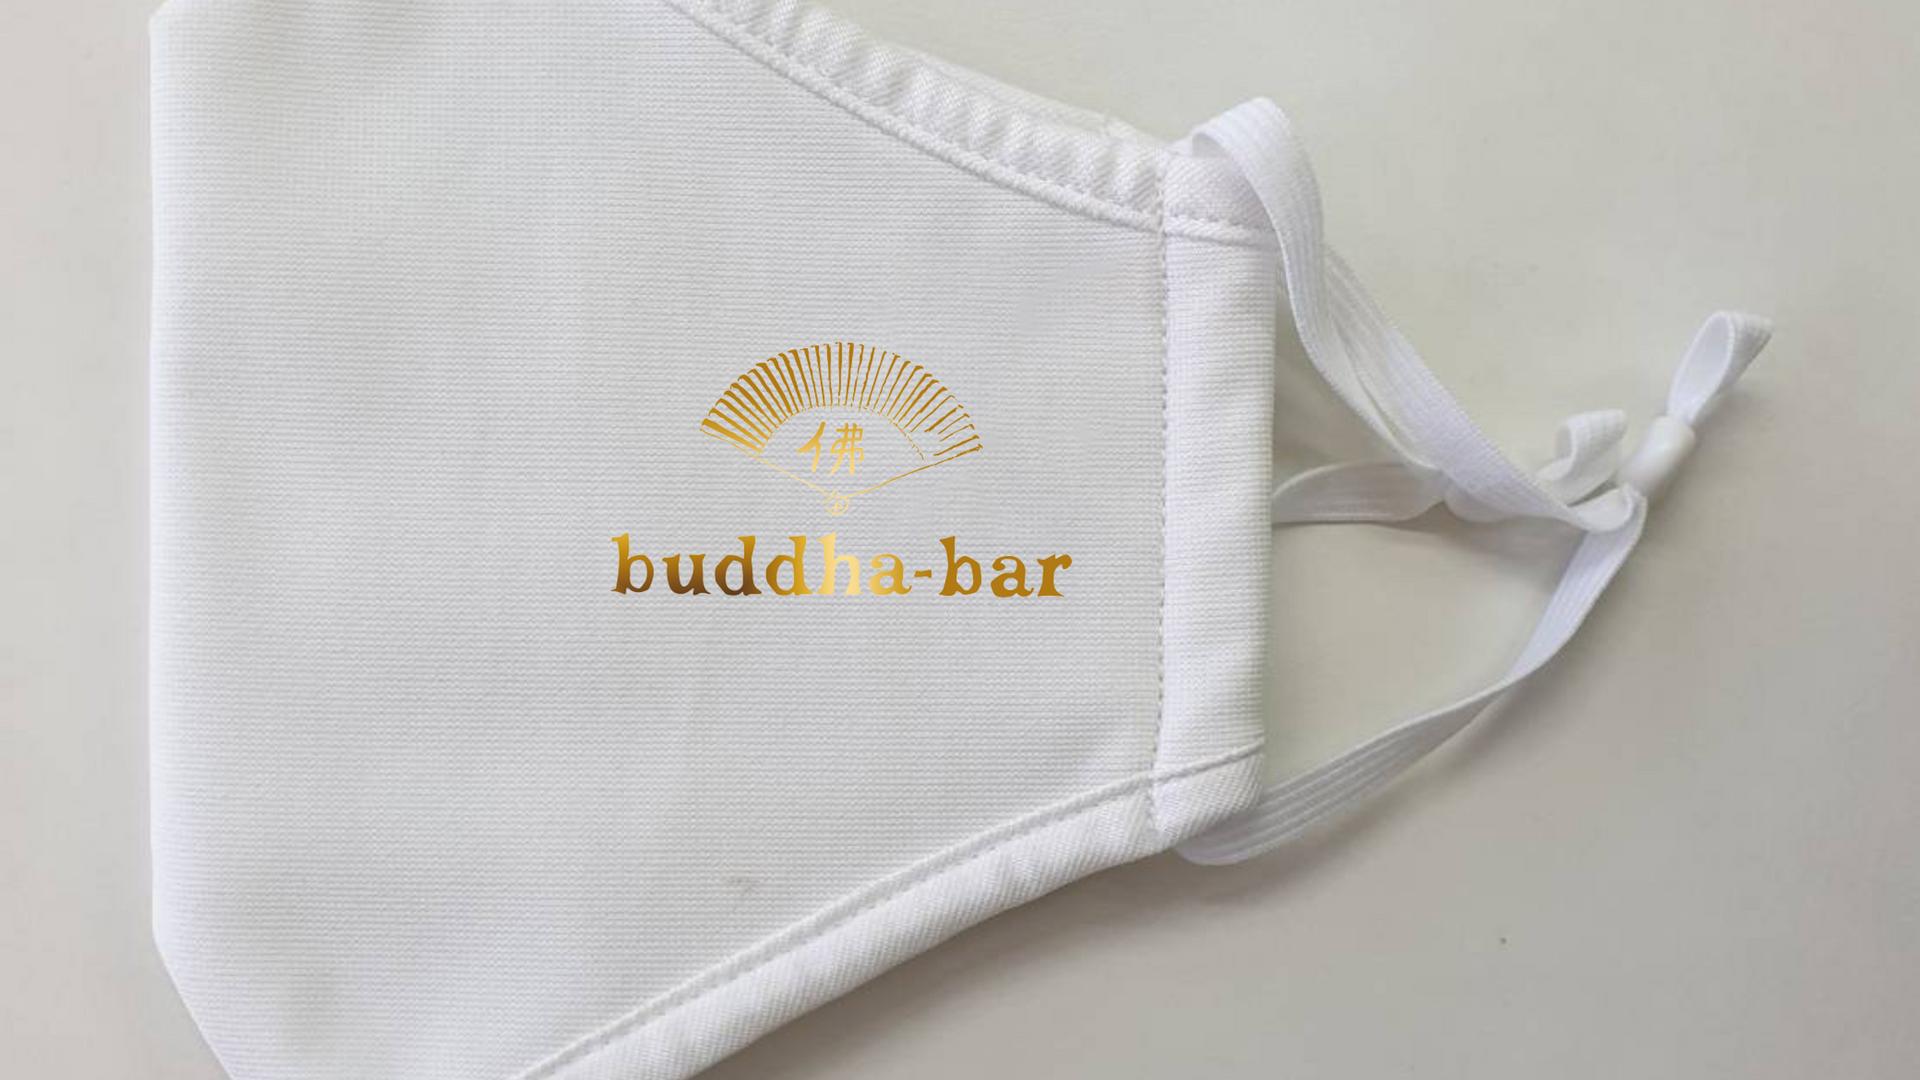 Buddha Bar 2.png